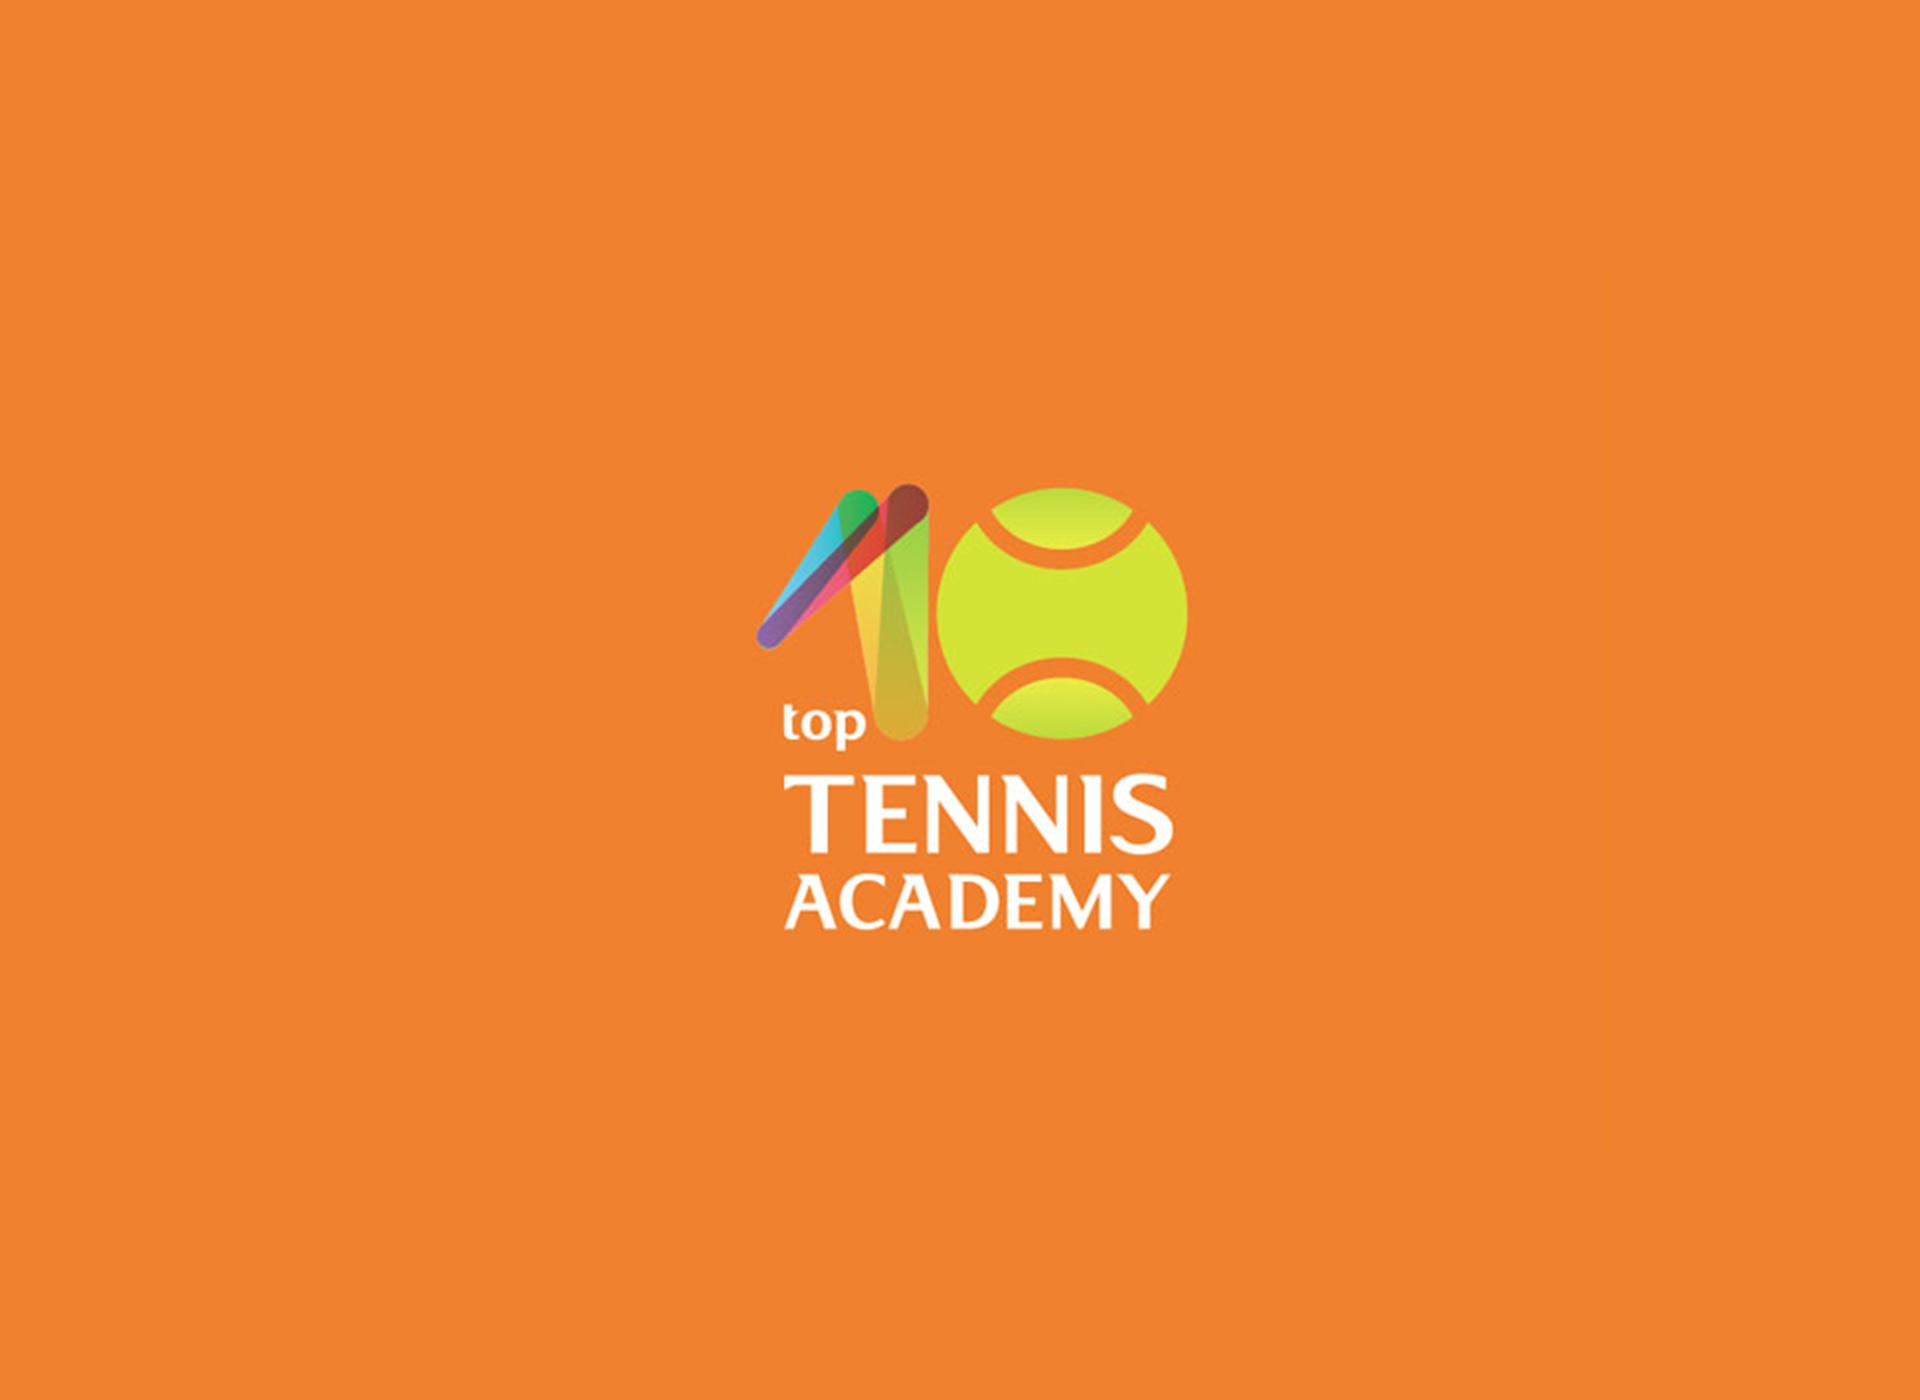 Top 10 Tennis Academy